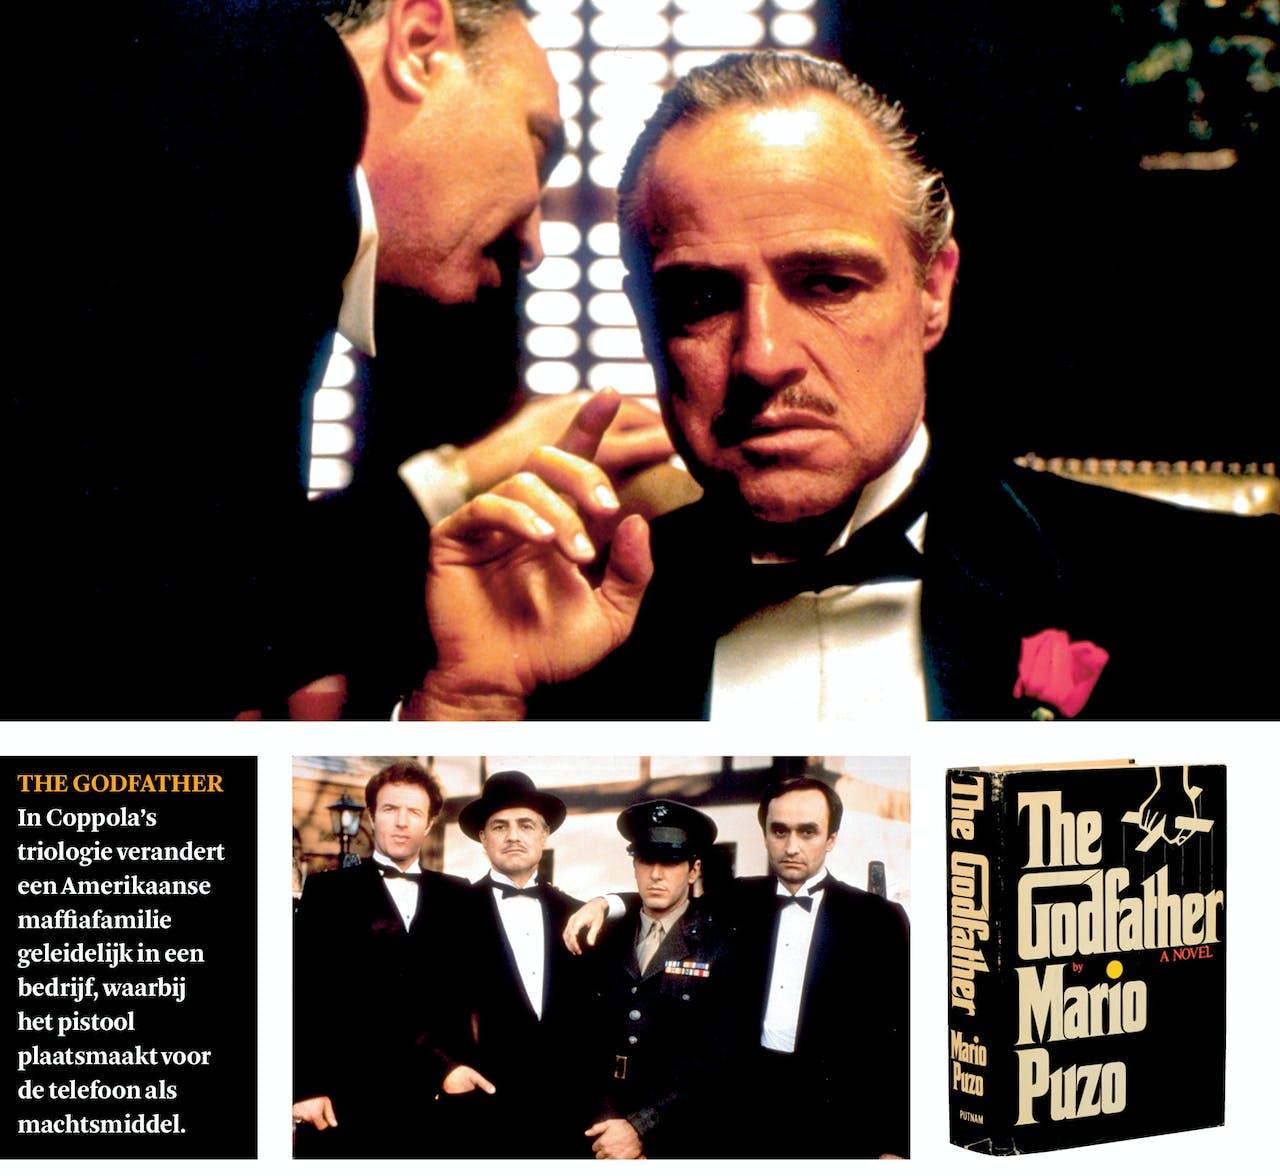 Marlon Brando als peetvader Don Vito Corleone, samen met zijn zoons Sonny, Michael en Fredo (onder).